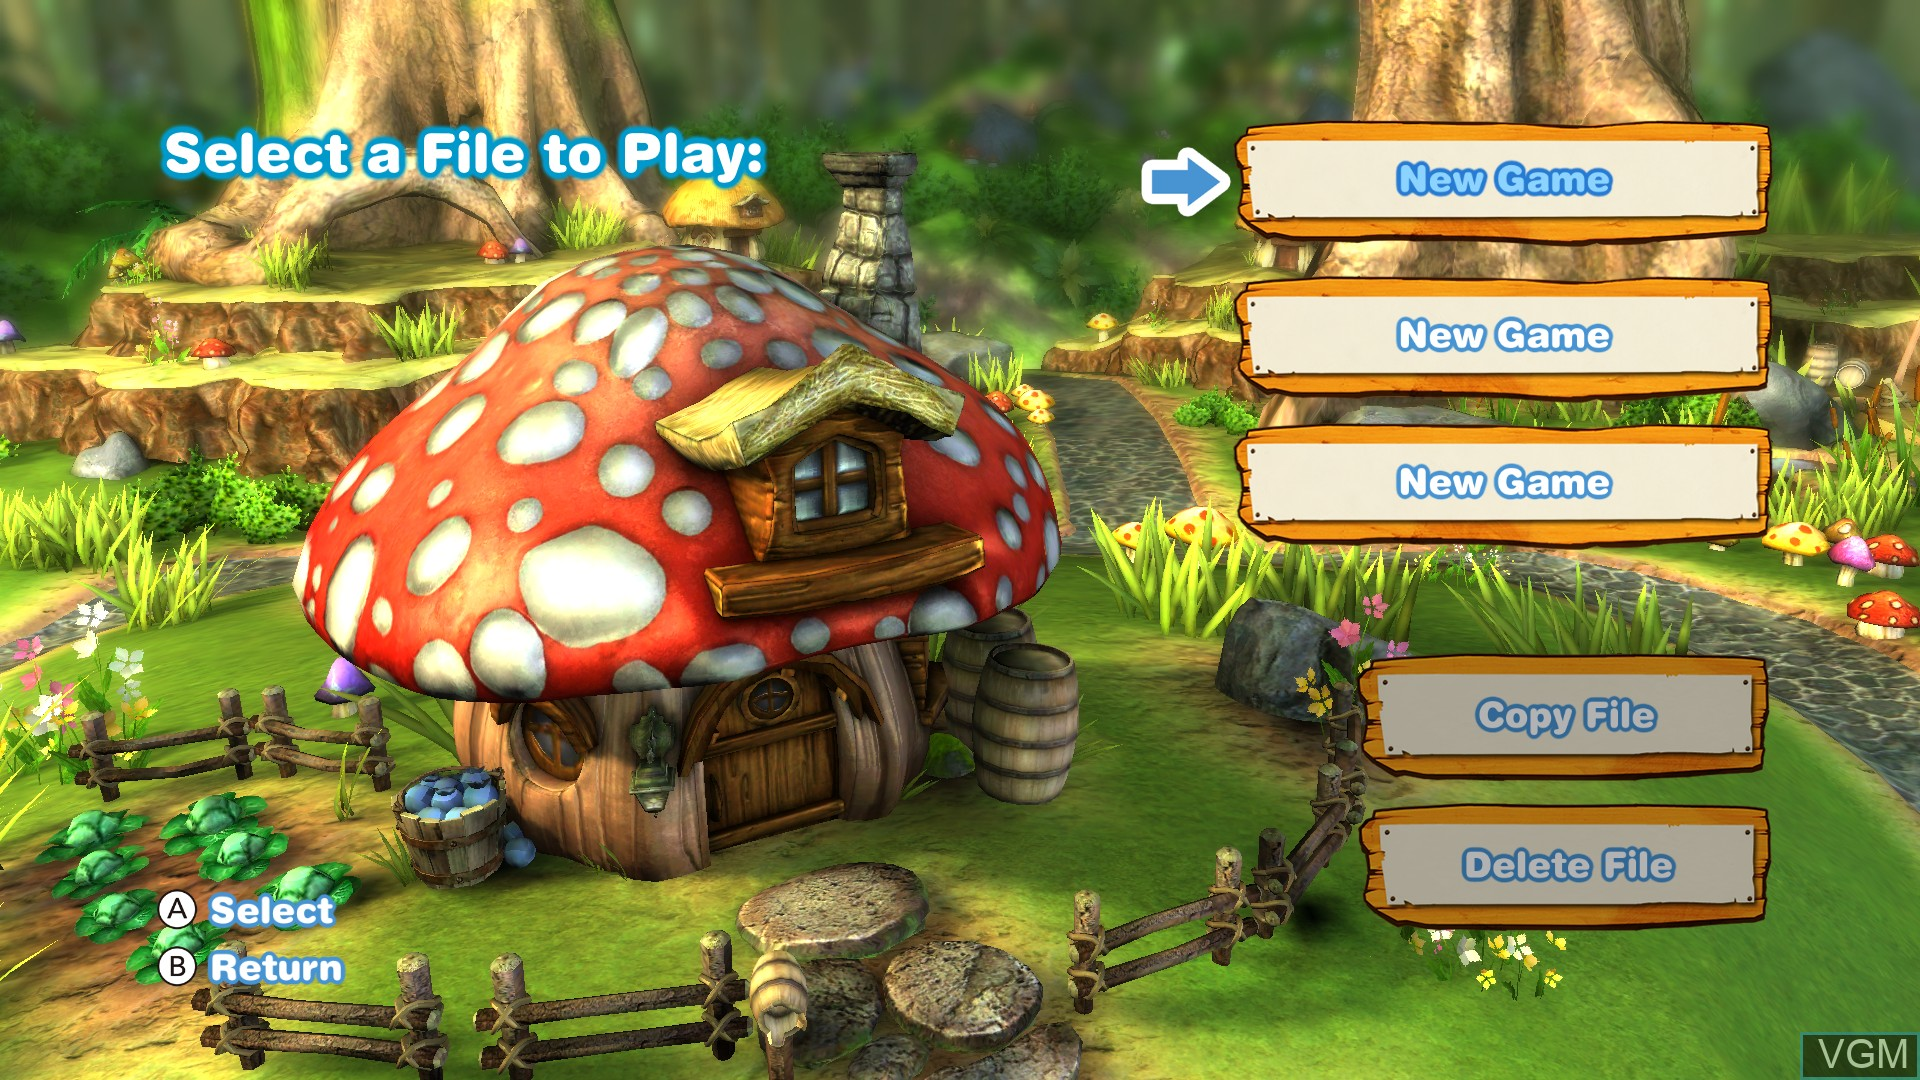 Menu screen of the game Smurfs 2, The on Nintendo Wii U